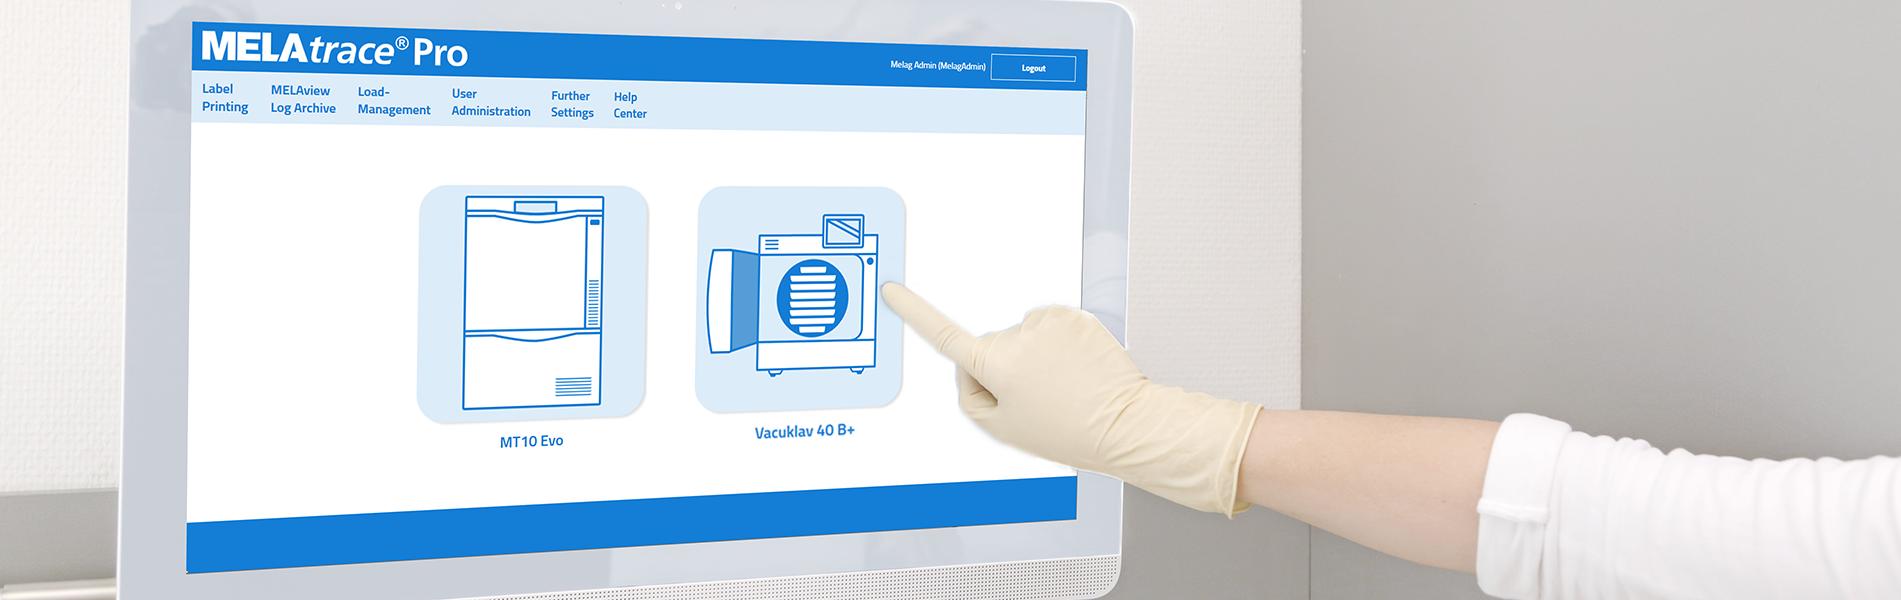 Perangkat lunak dokumentasi MELAtrace layar sentuh